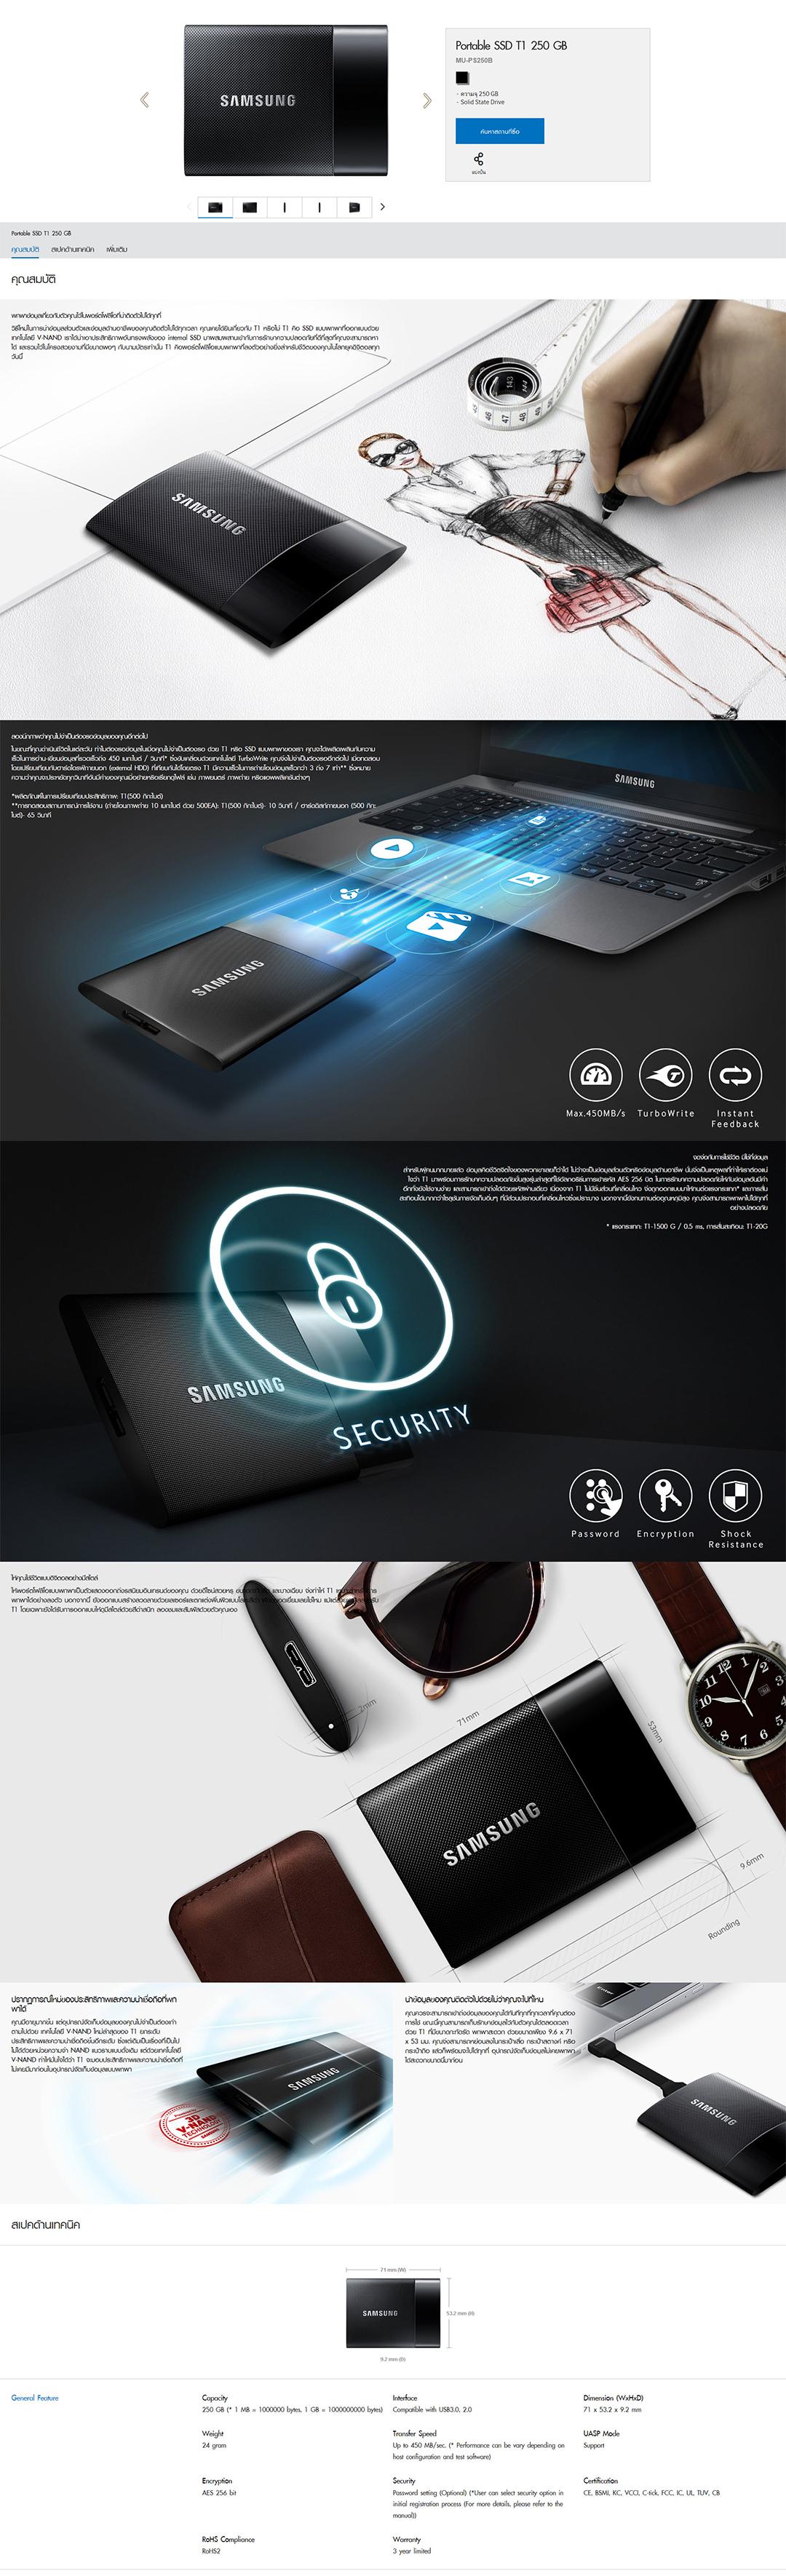 spec Samsung Portable SSD T1 250 GB